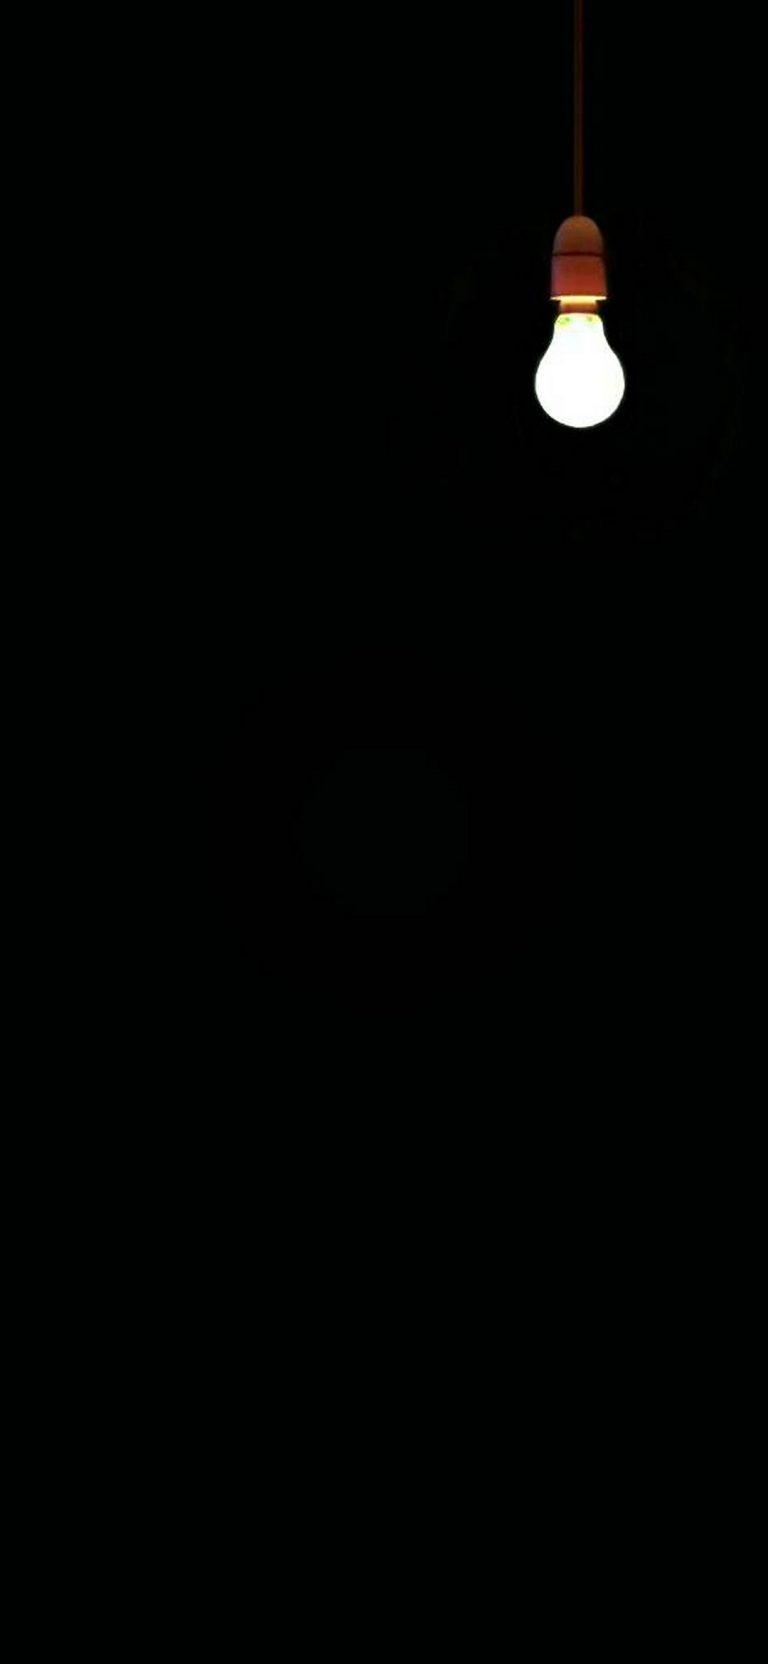 Black Phone Wallpaper 1080x2340 025 768x1664